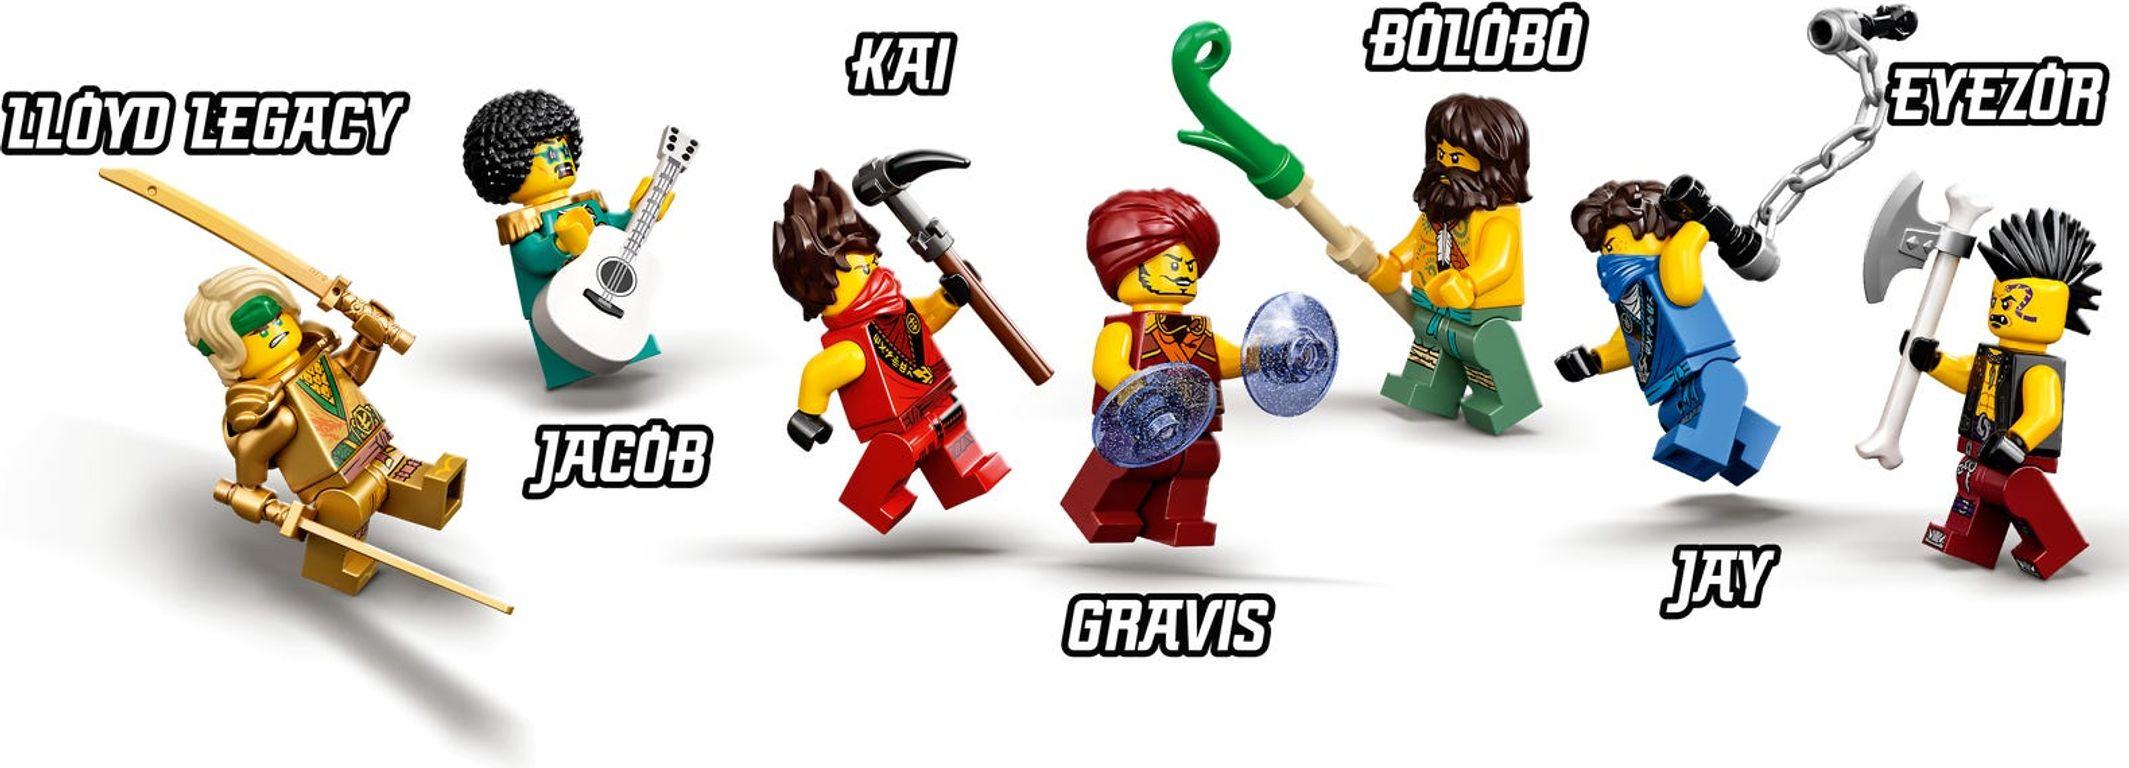 LEGO® Ninjago Tournament of Elements minifigures